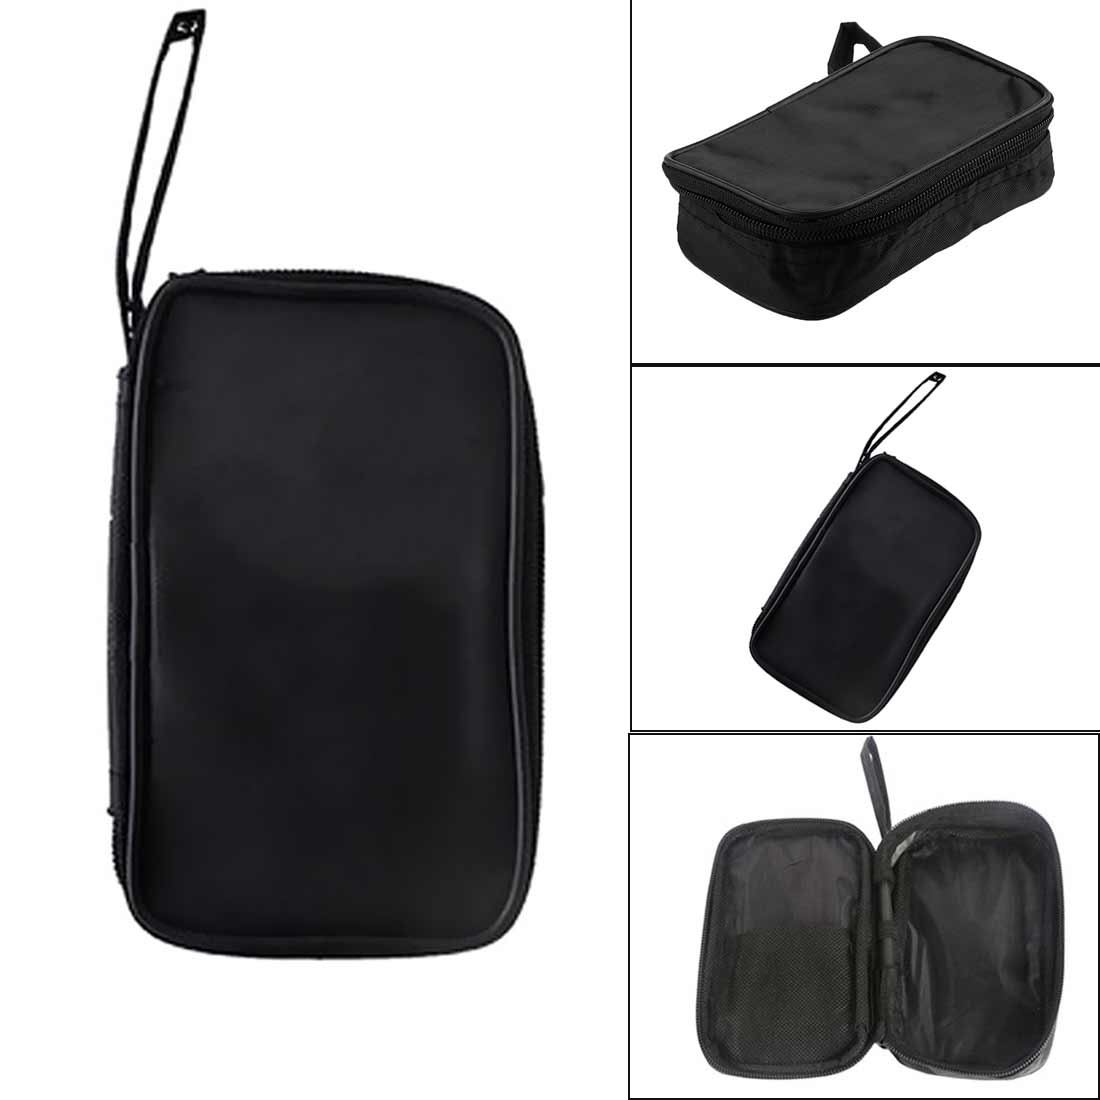 Tool Bag 23x14x5cm Multimeter Black Colth Bag Durable Waterproof Shockproof Soft Case